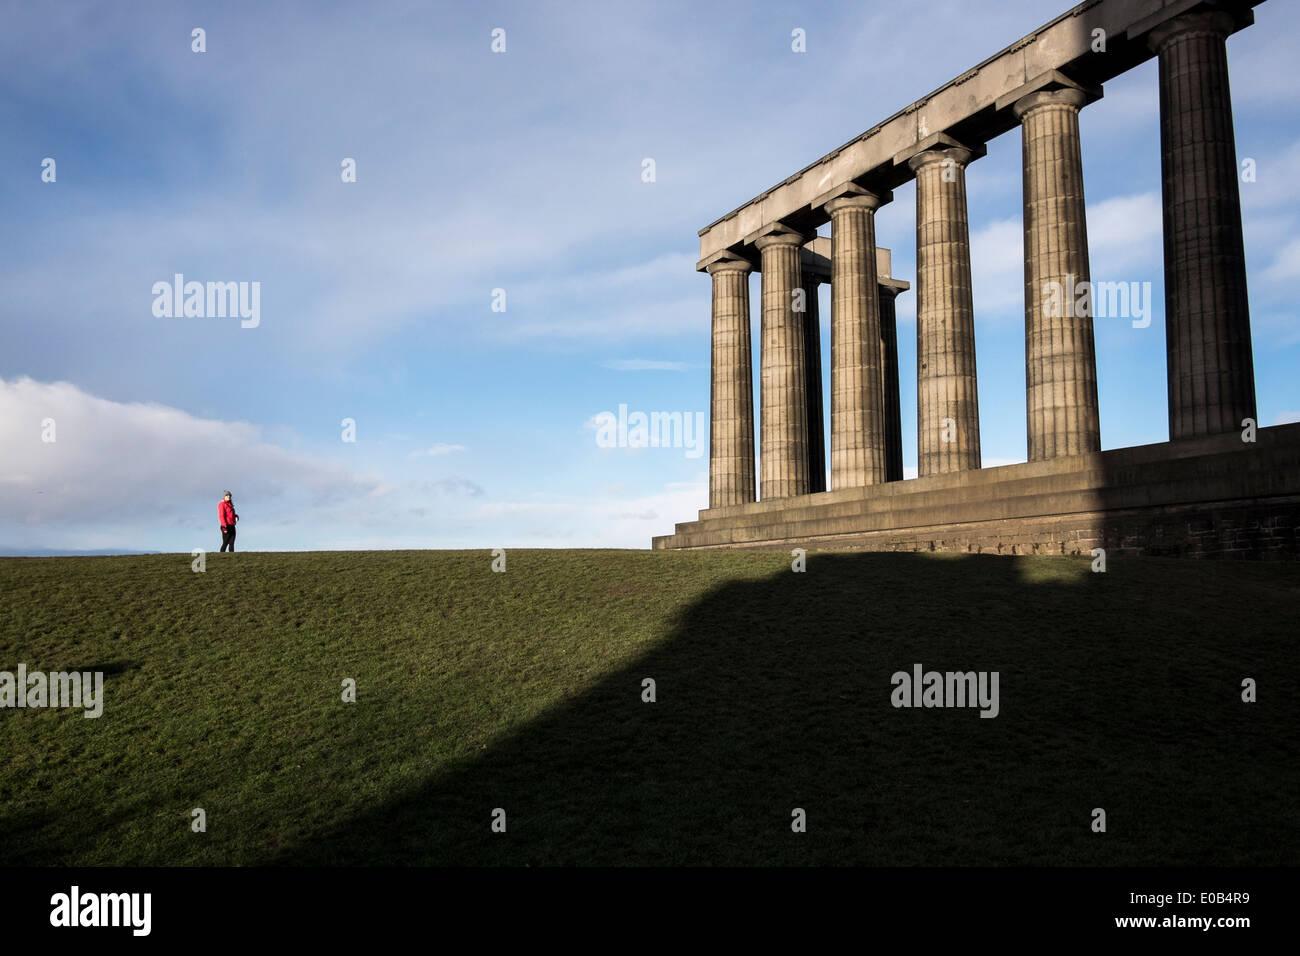 The Monument of Scotland in Edinburgh - Stock Image